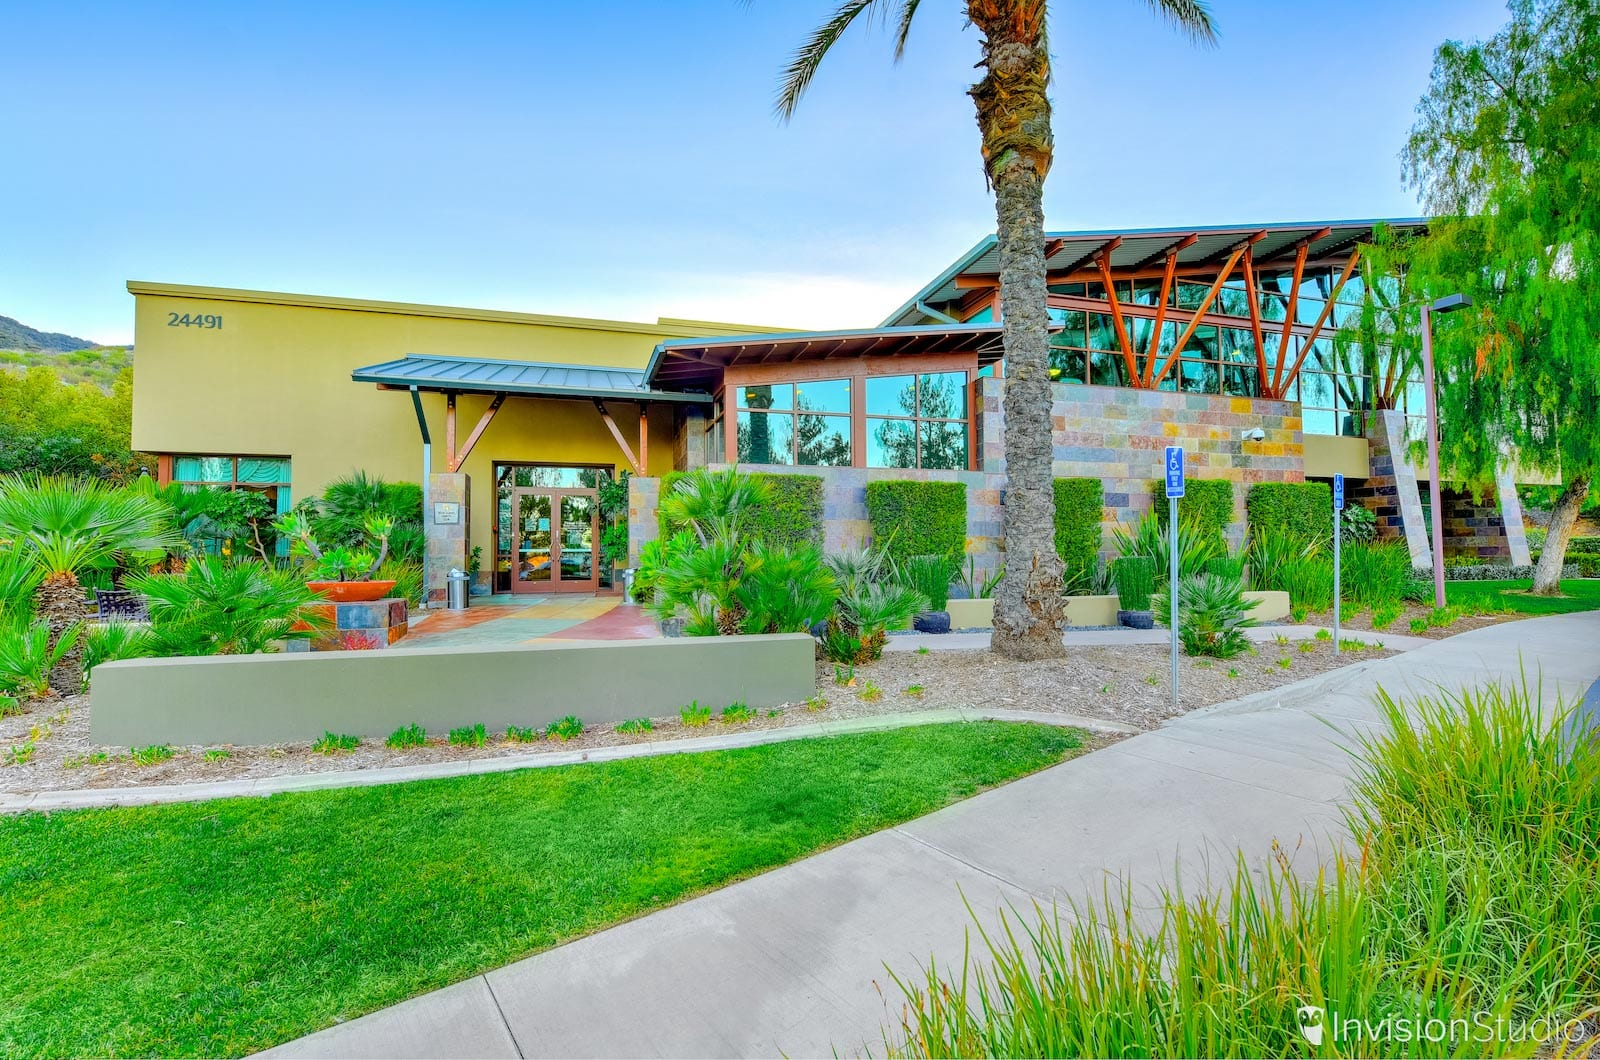 Long Beach 360 Panoramic Photography Services   Long Beach Drone Aerial Photography Services   Long Beach Architectural Photography Services   Long Beach Matterport 3D House Tours